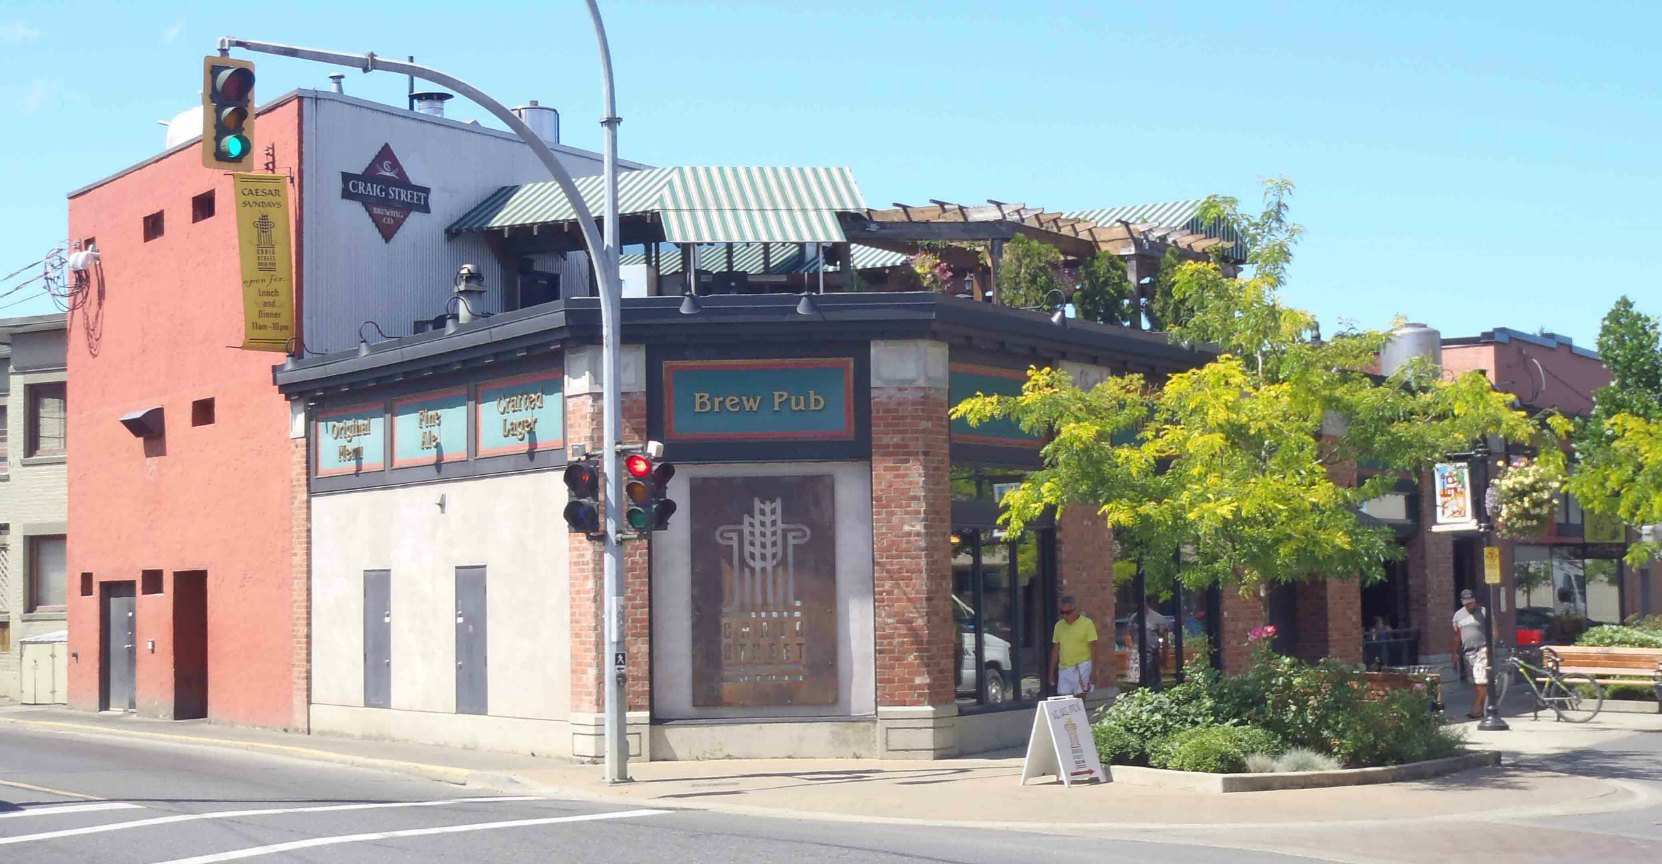 Craig Street Brew Pub, 25 Craig Street. Powel's Men's Wear occupied this building 1972-2004